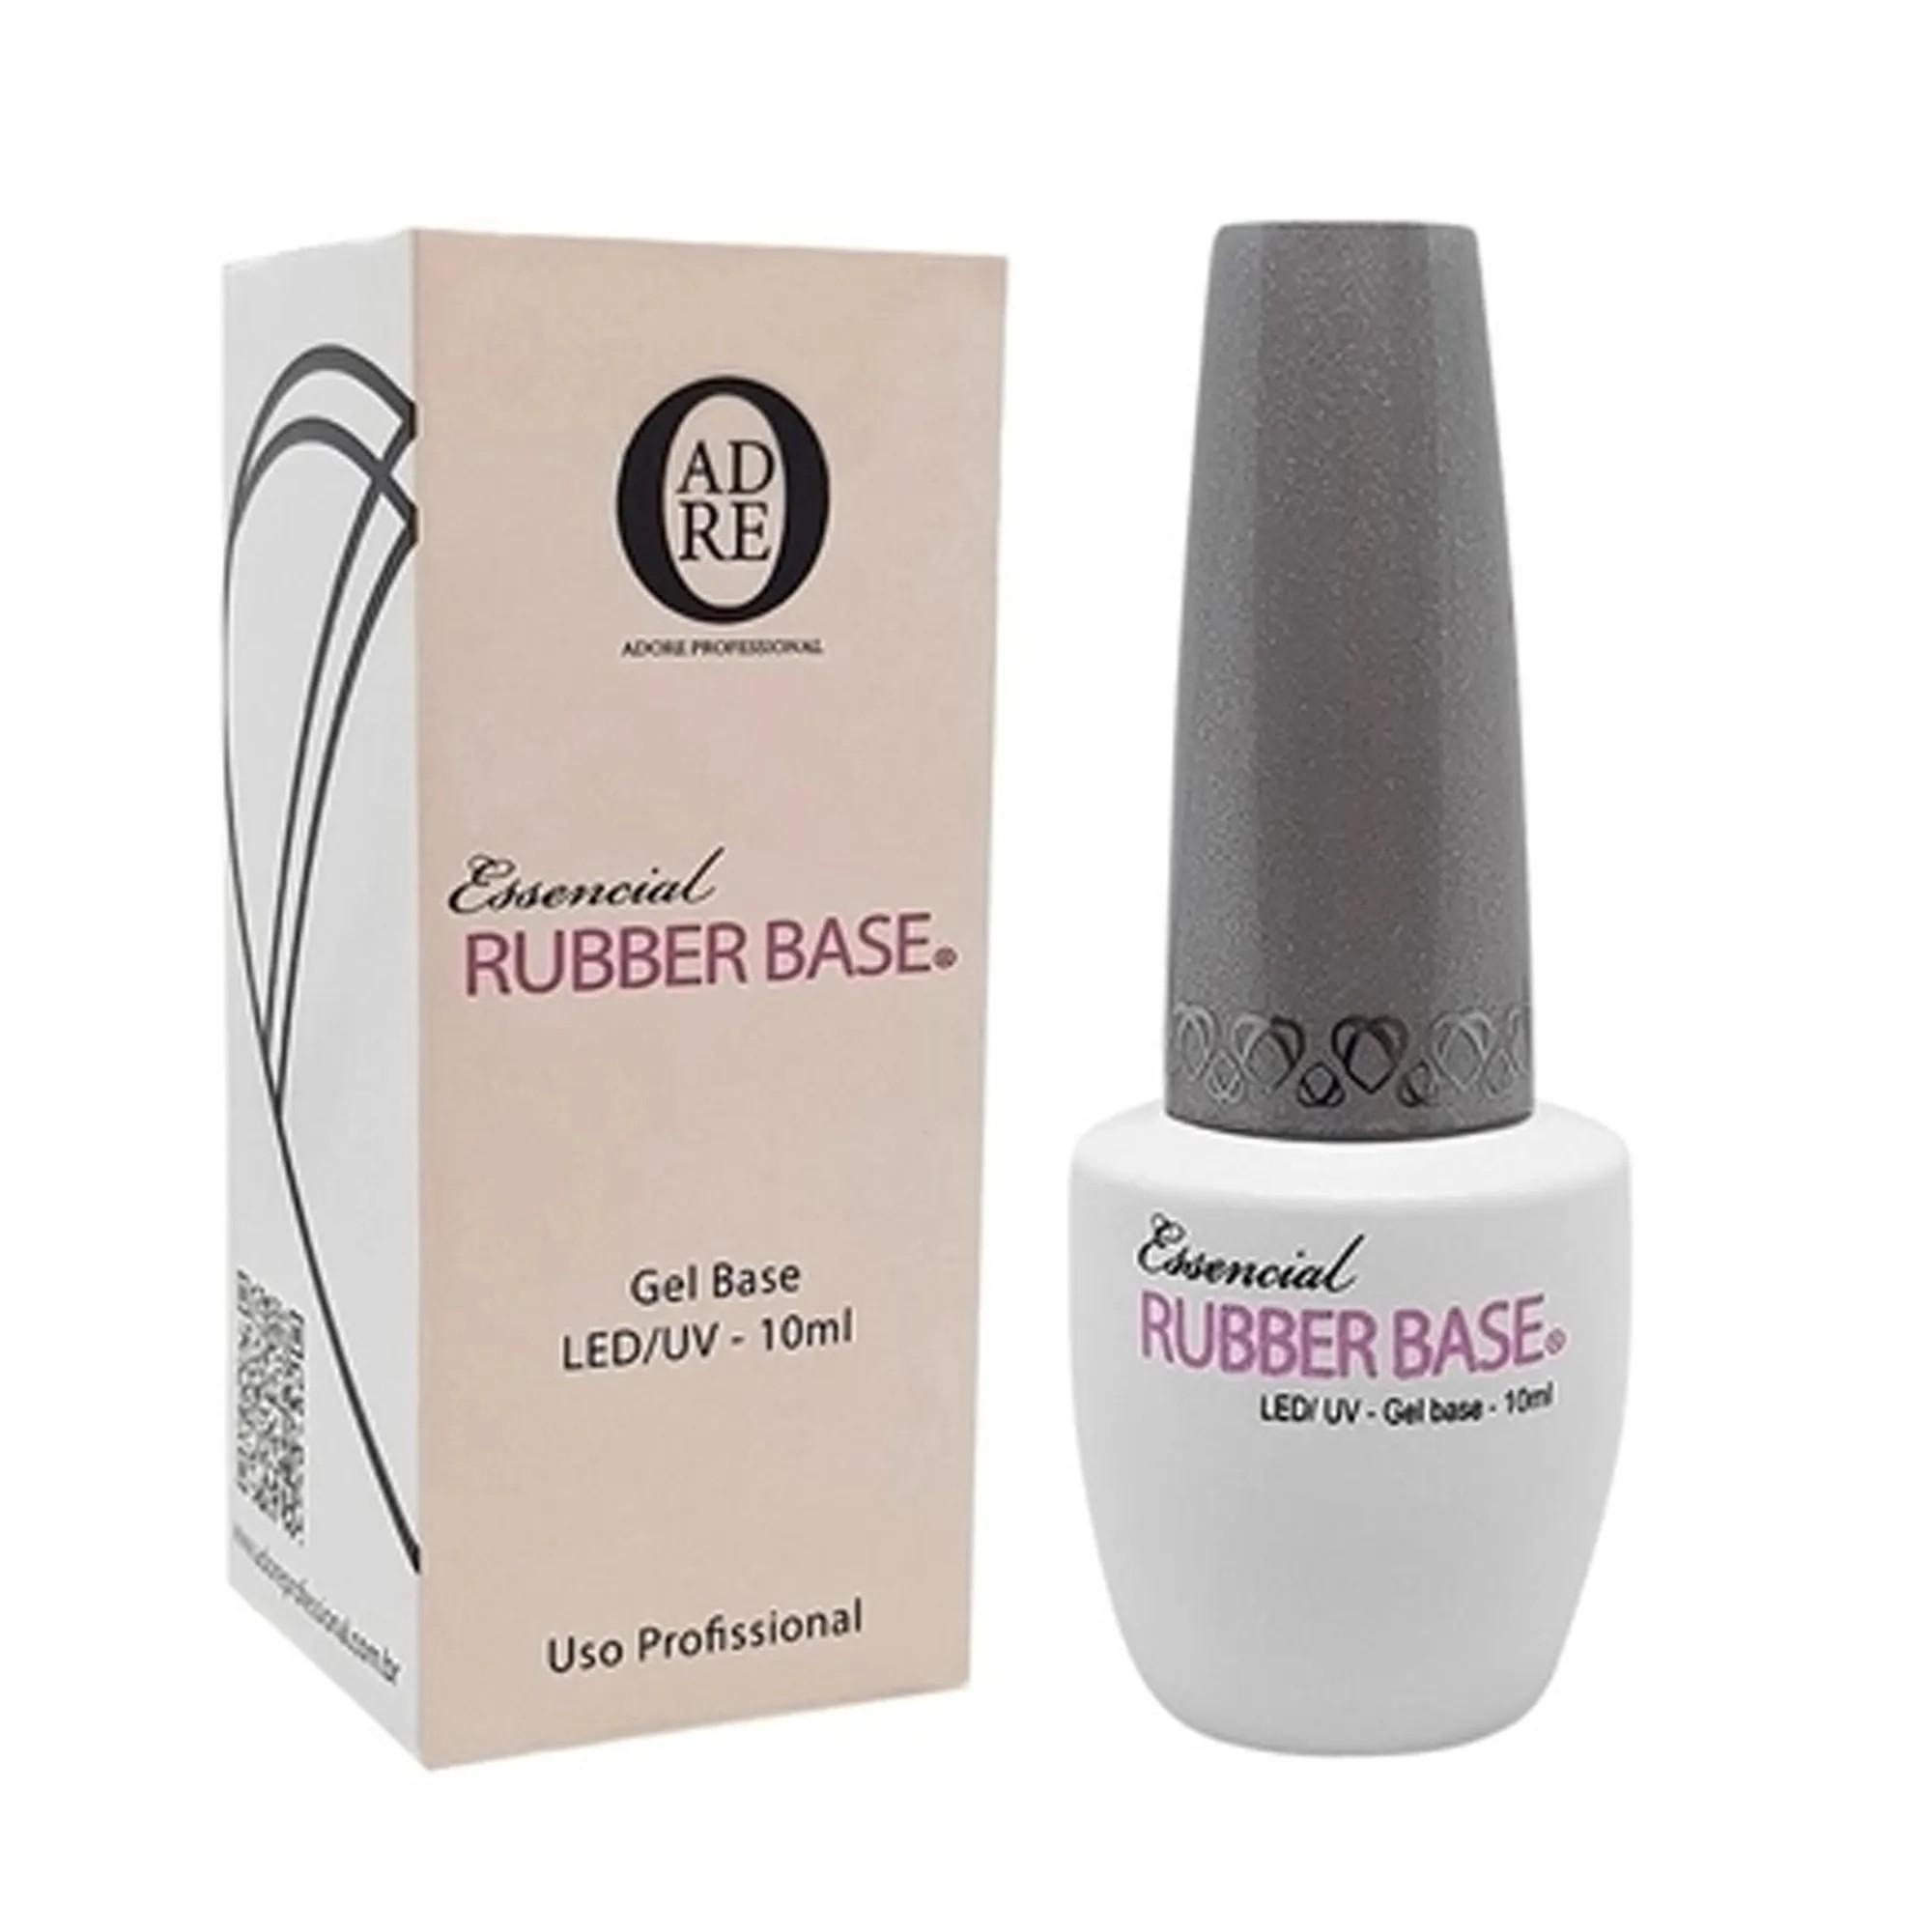 Gel Base Adore Essencial Rubber Ruber Base Led/Uv 10ml